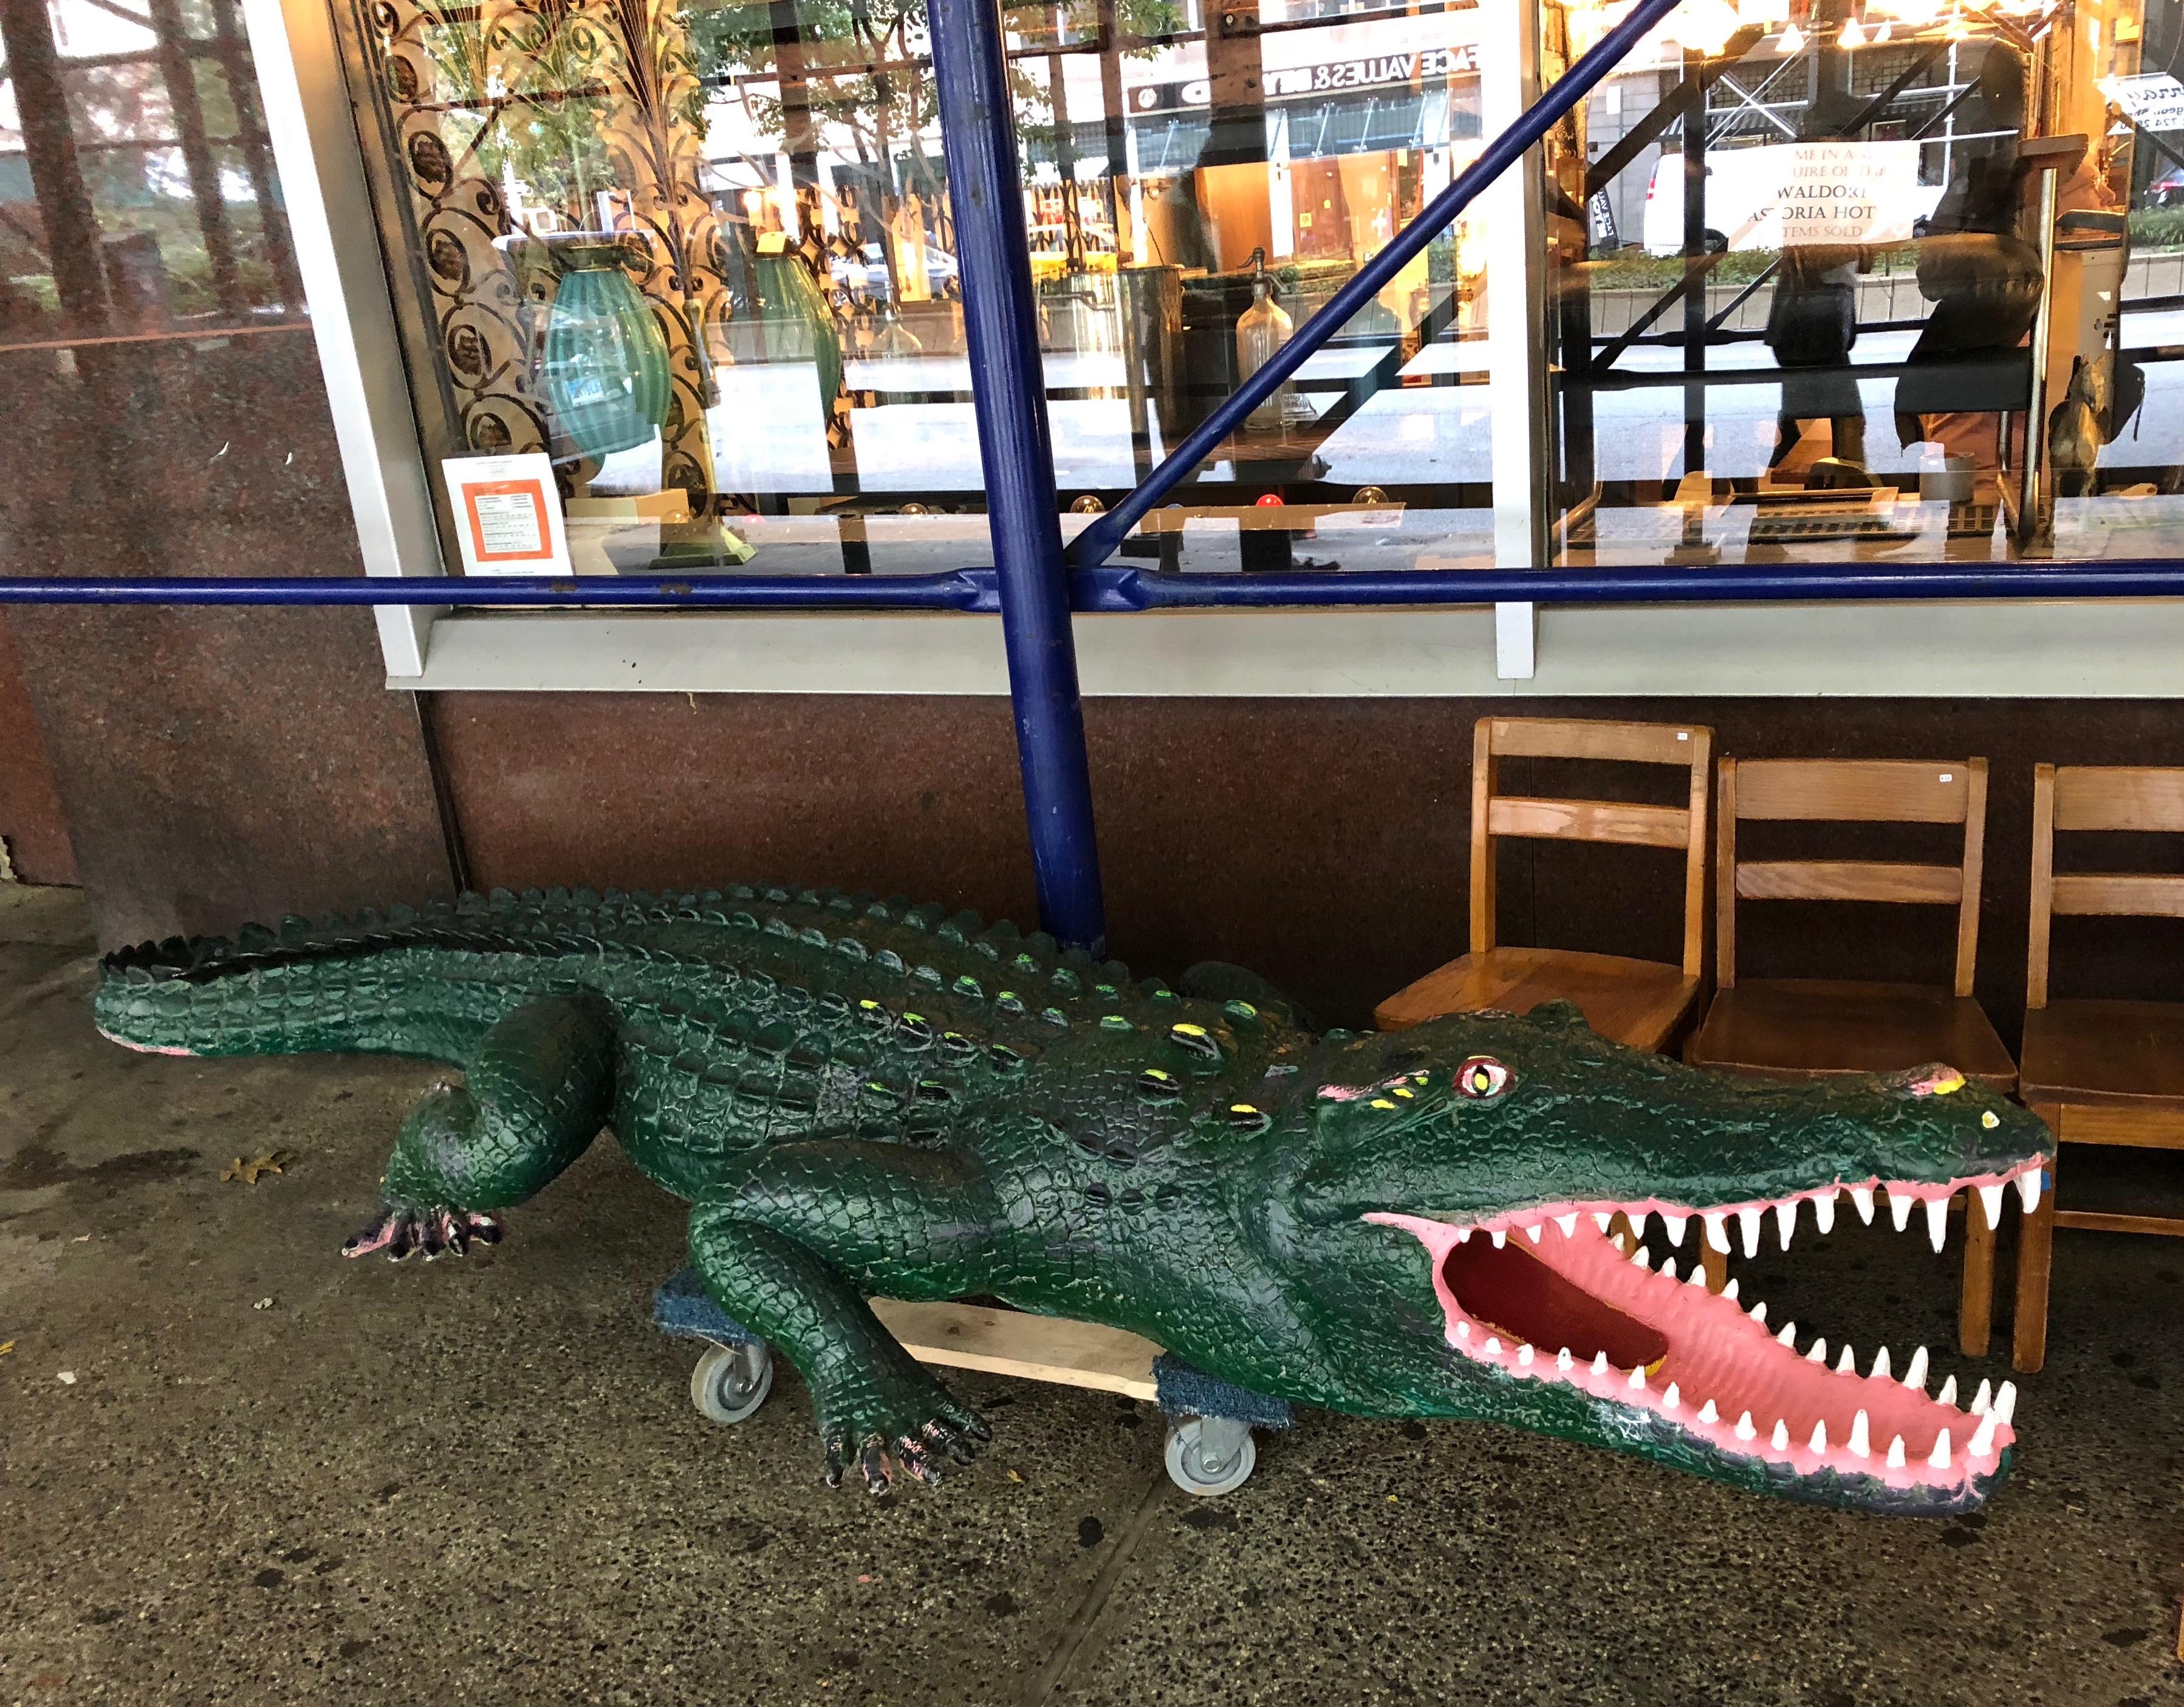 091918-alligator-in-New-York